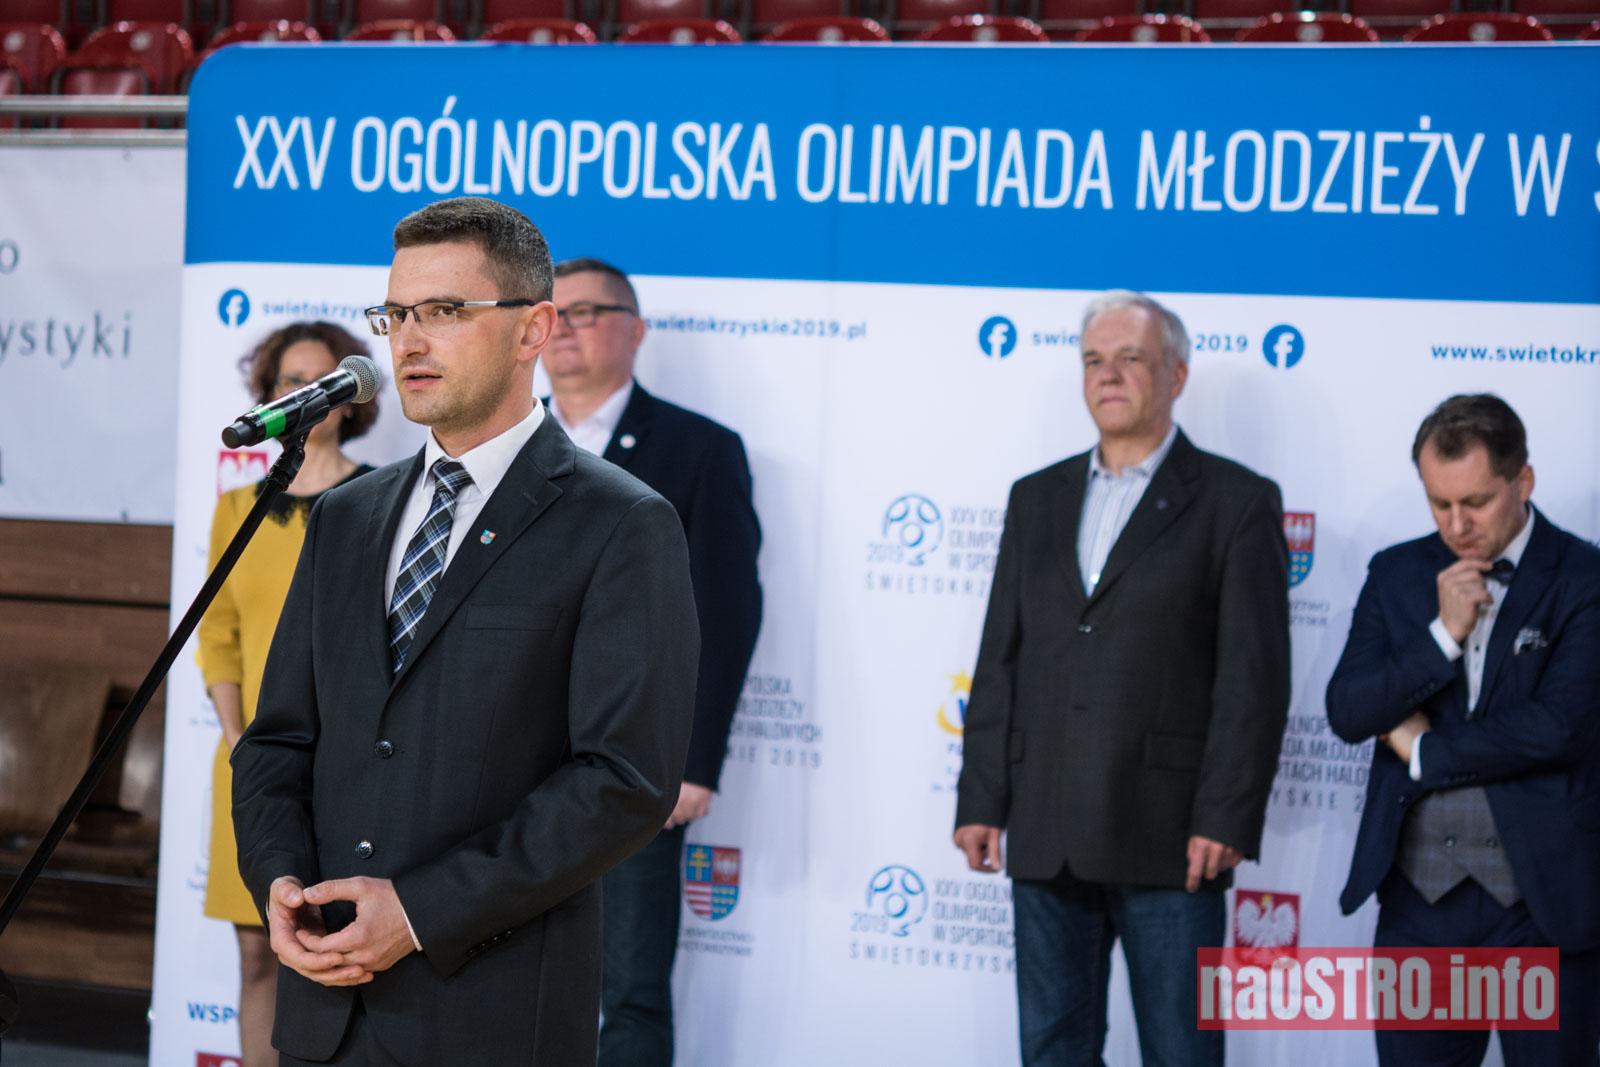 NaOSTRO Olimpiada otwarcie-28